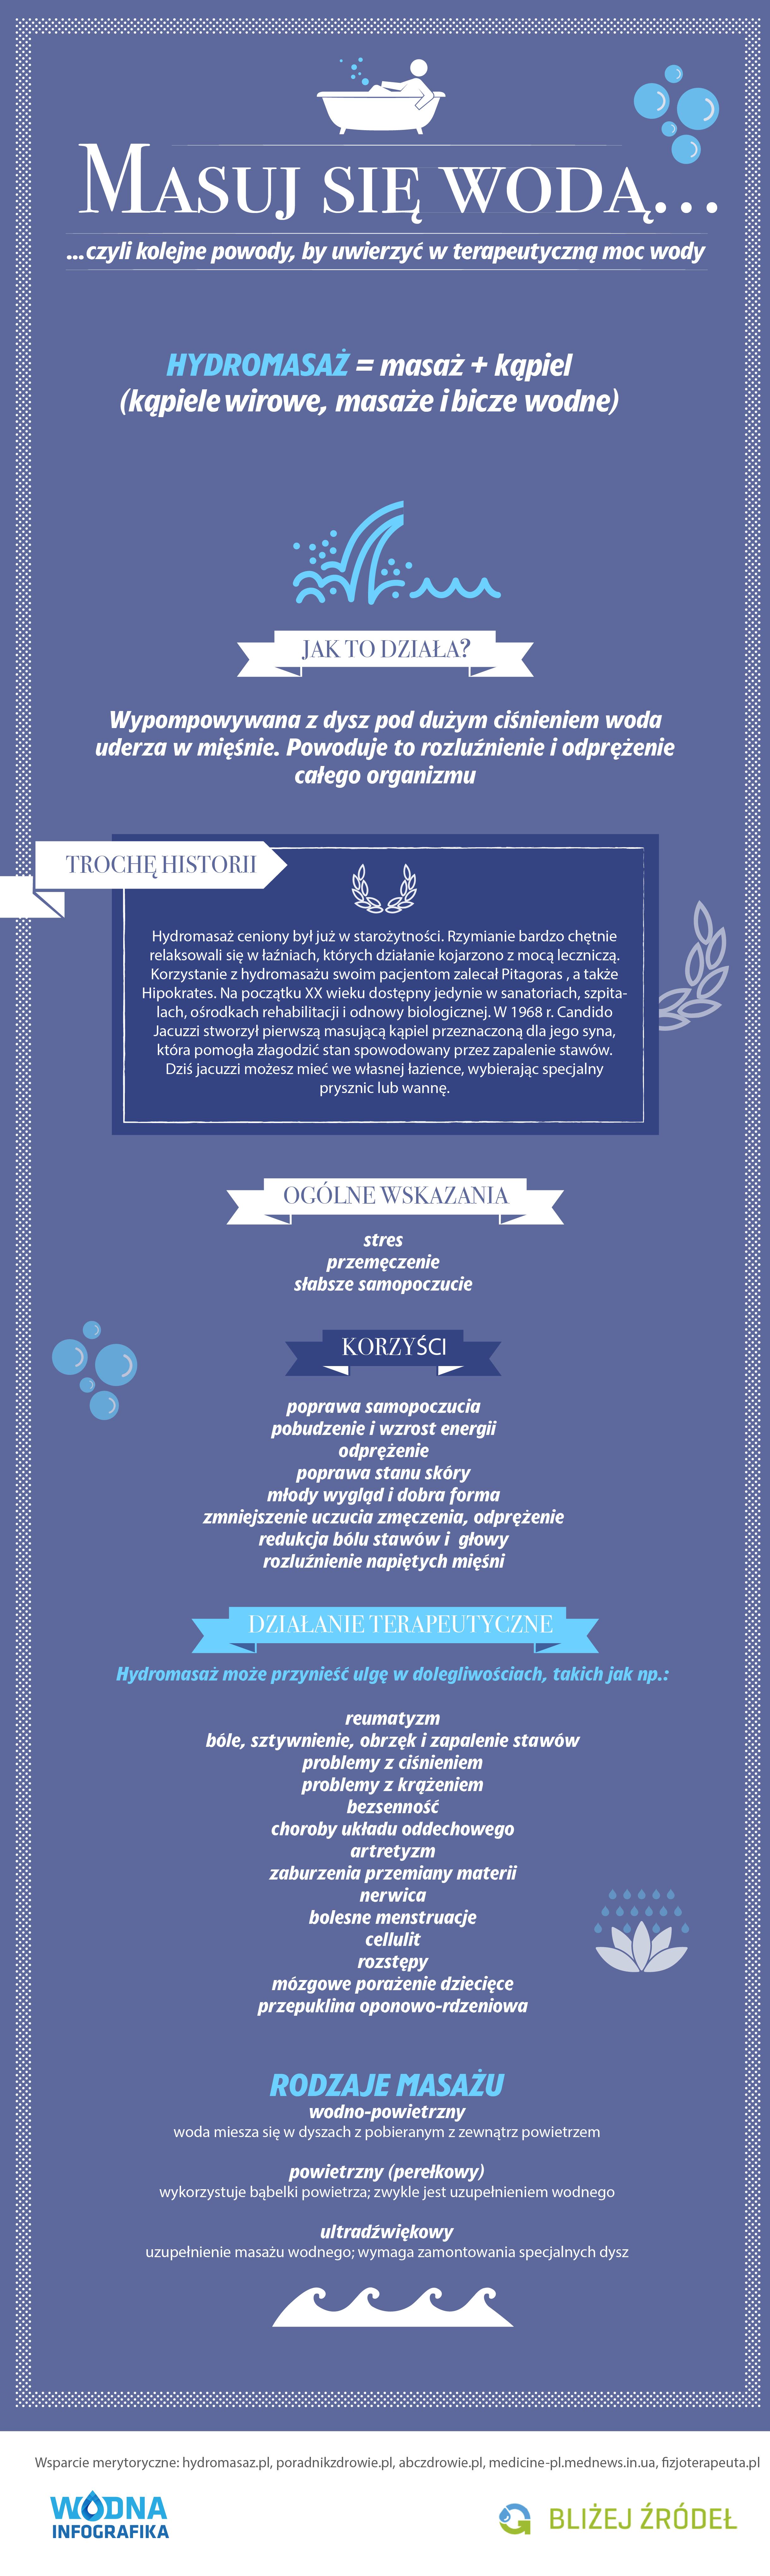 hydromasaz_wodna-infografika